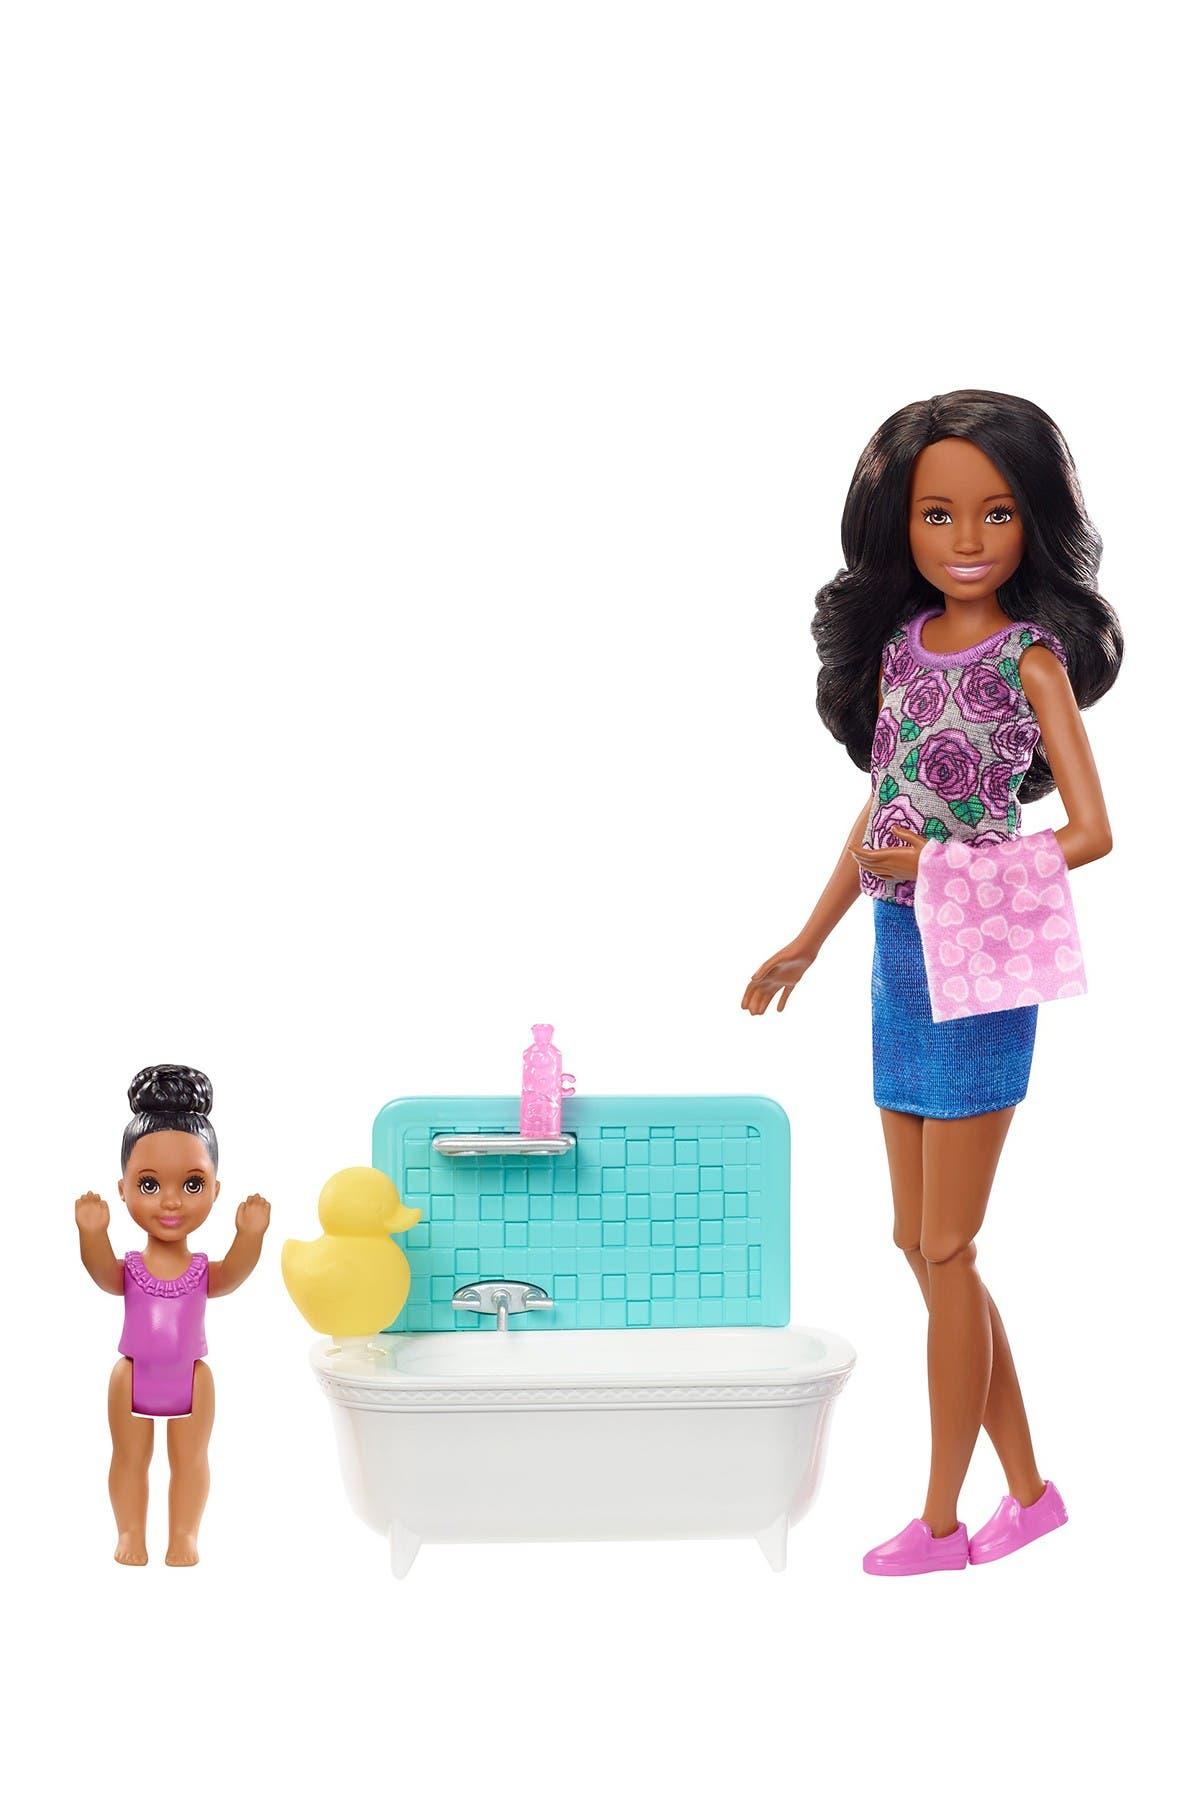 Image of Mattel Barbie(R) Skipper(R) Babysitters Inc (TM) Dolls & Playset